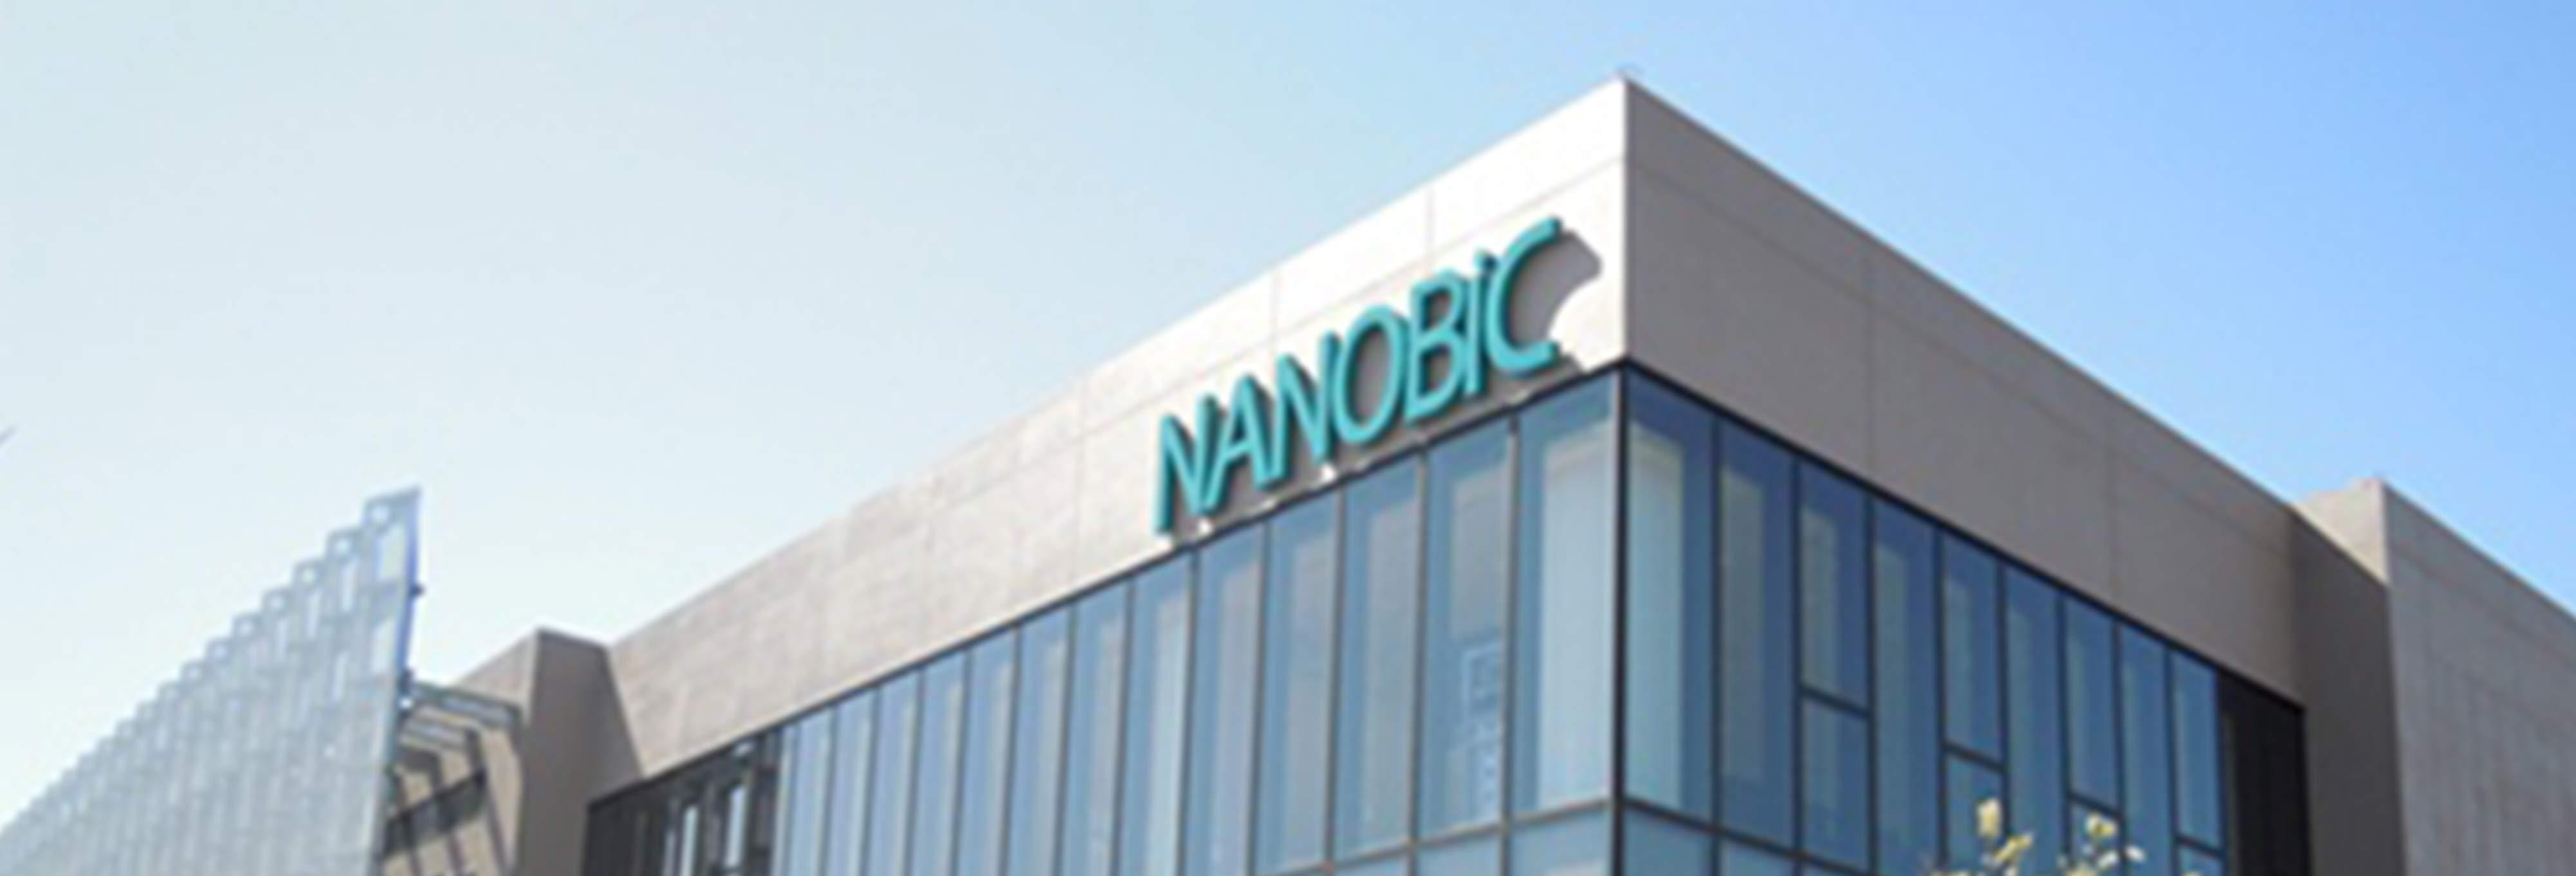 NANOBIC事業概要に関する画像